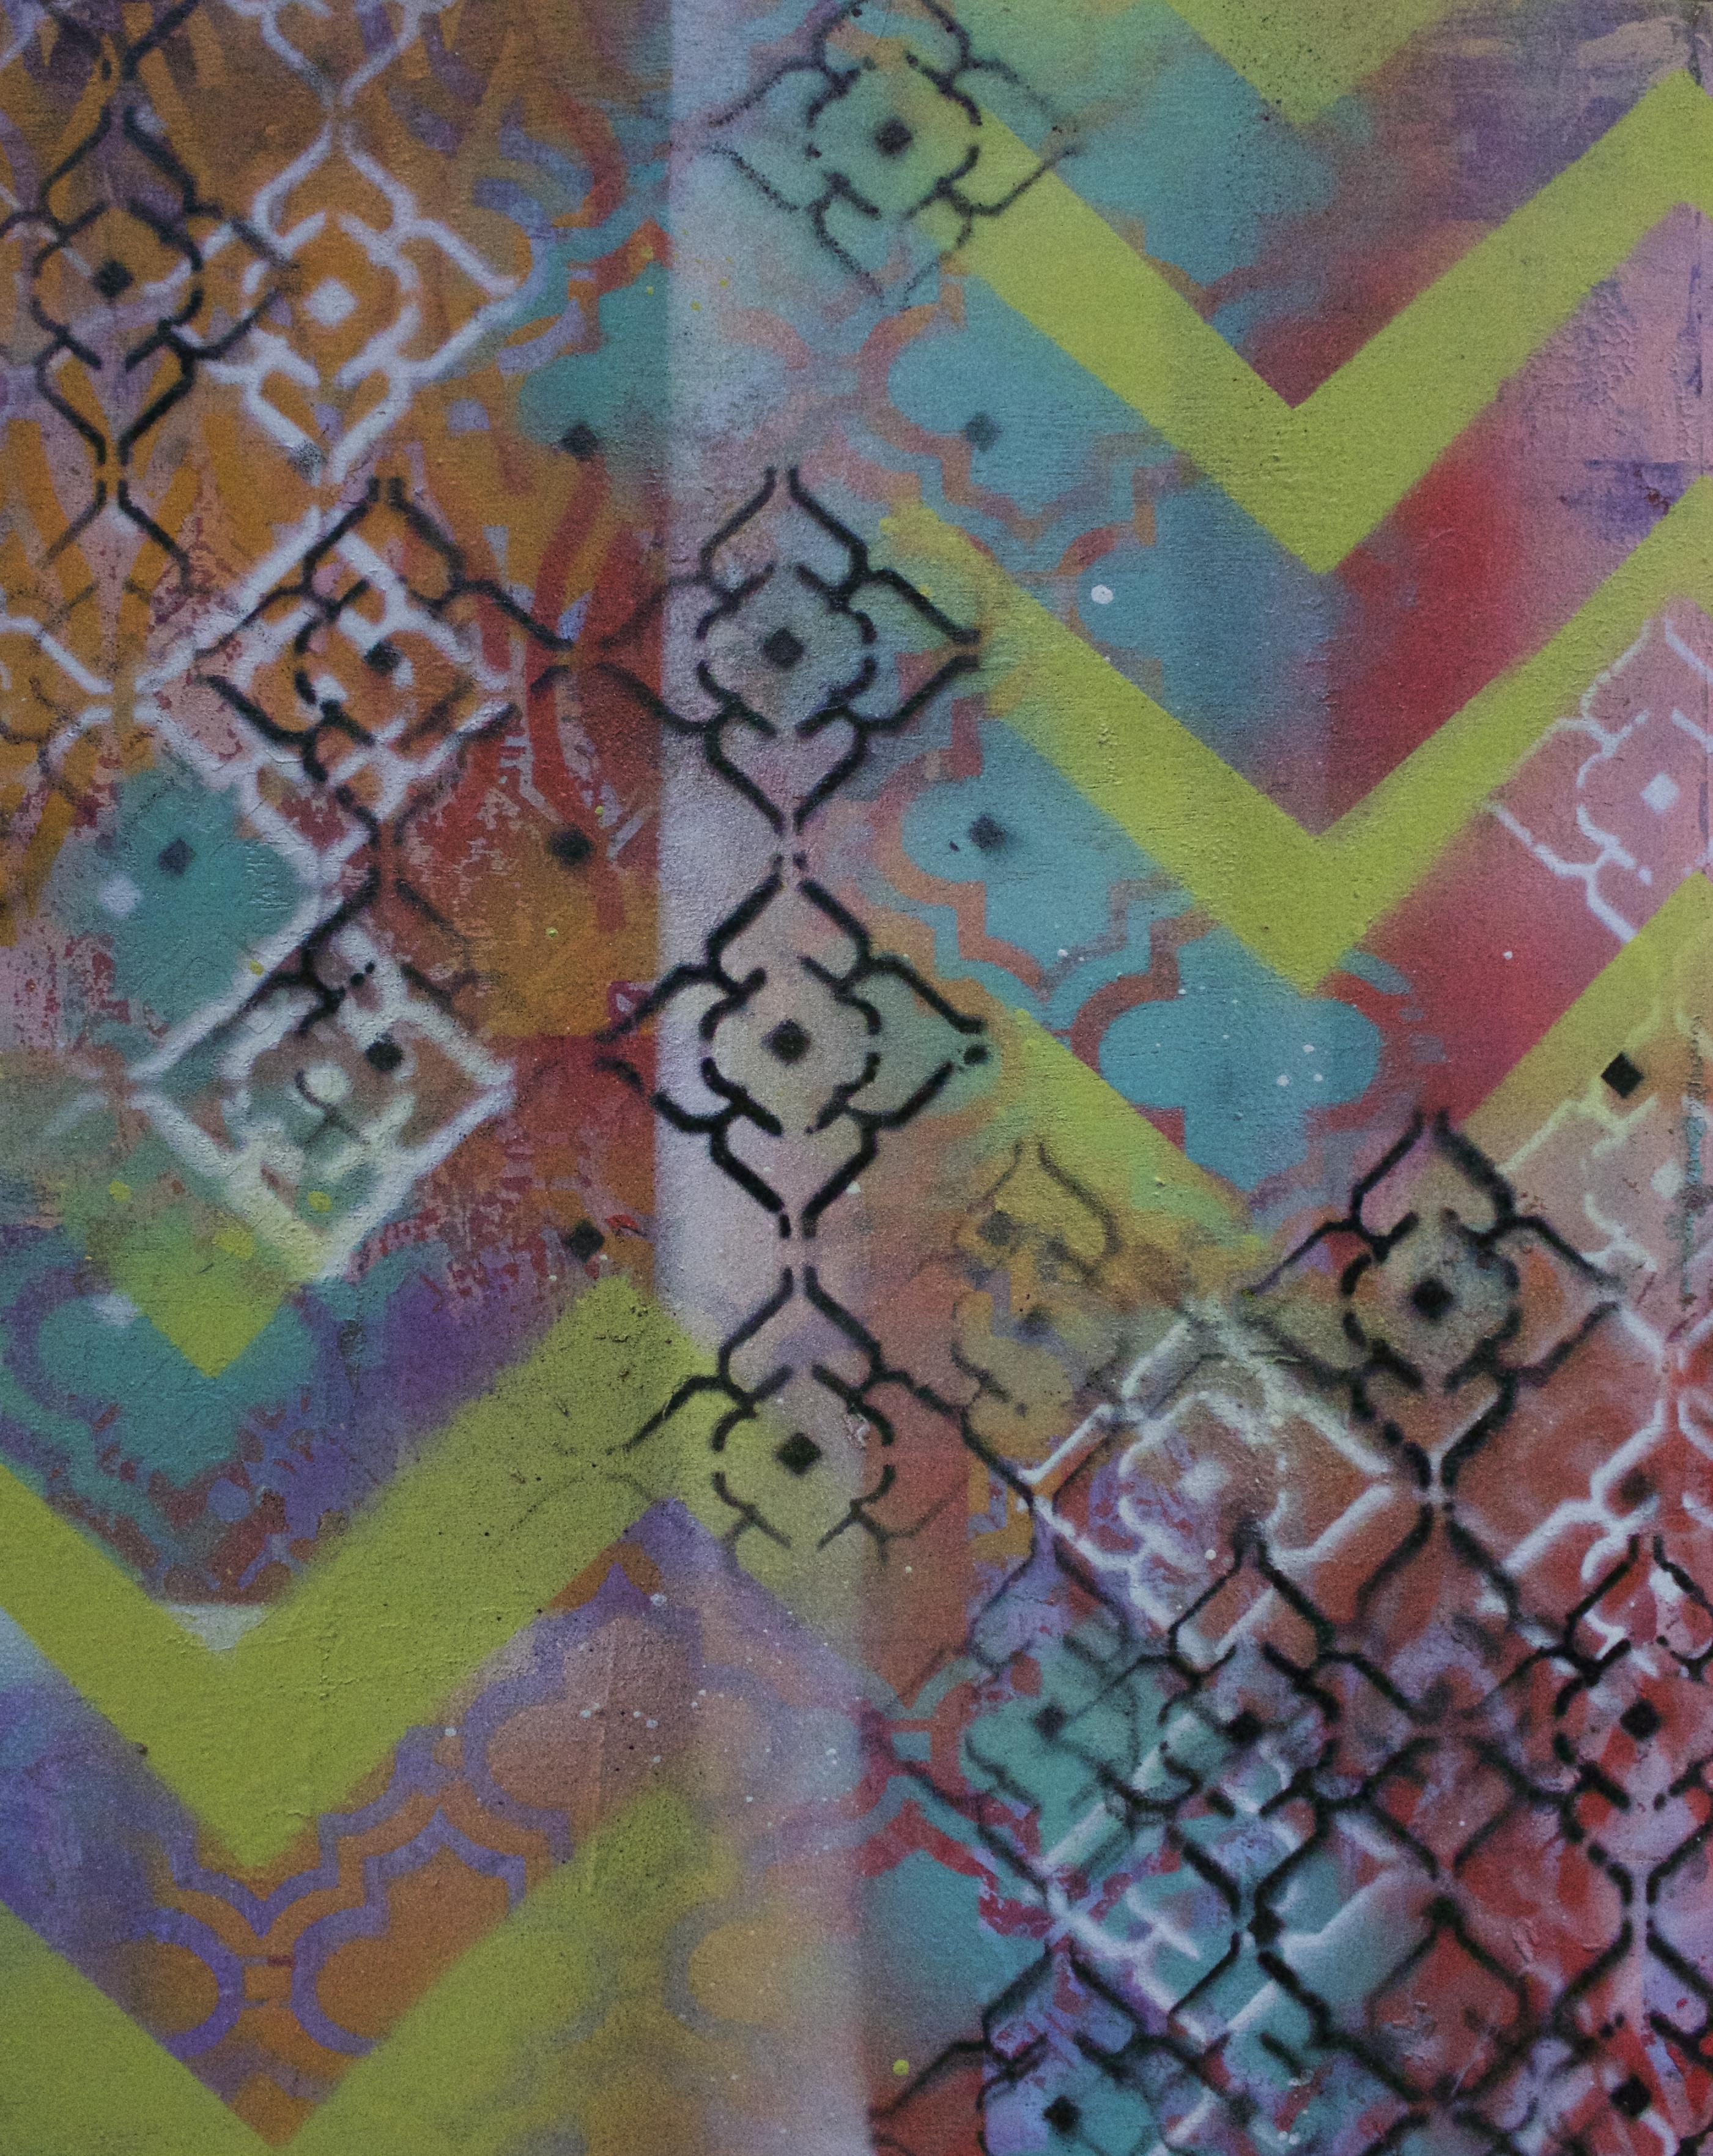 Acrylic on wood block, 8x10 - - SOLD